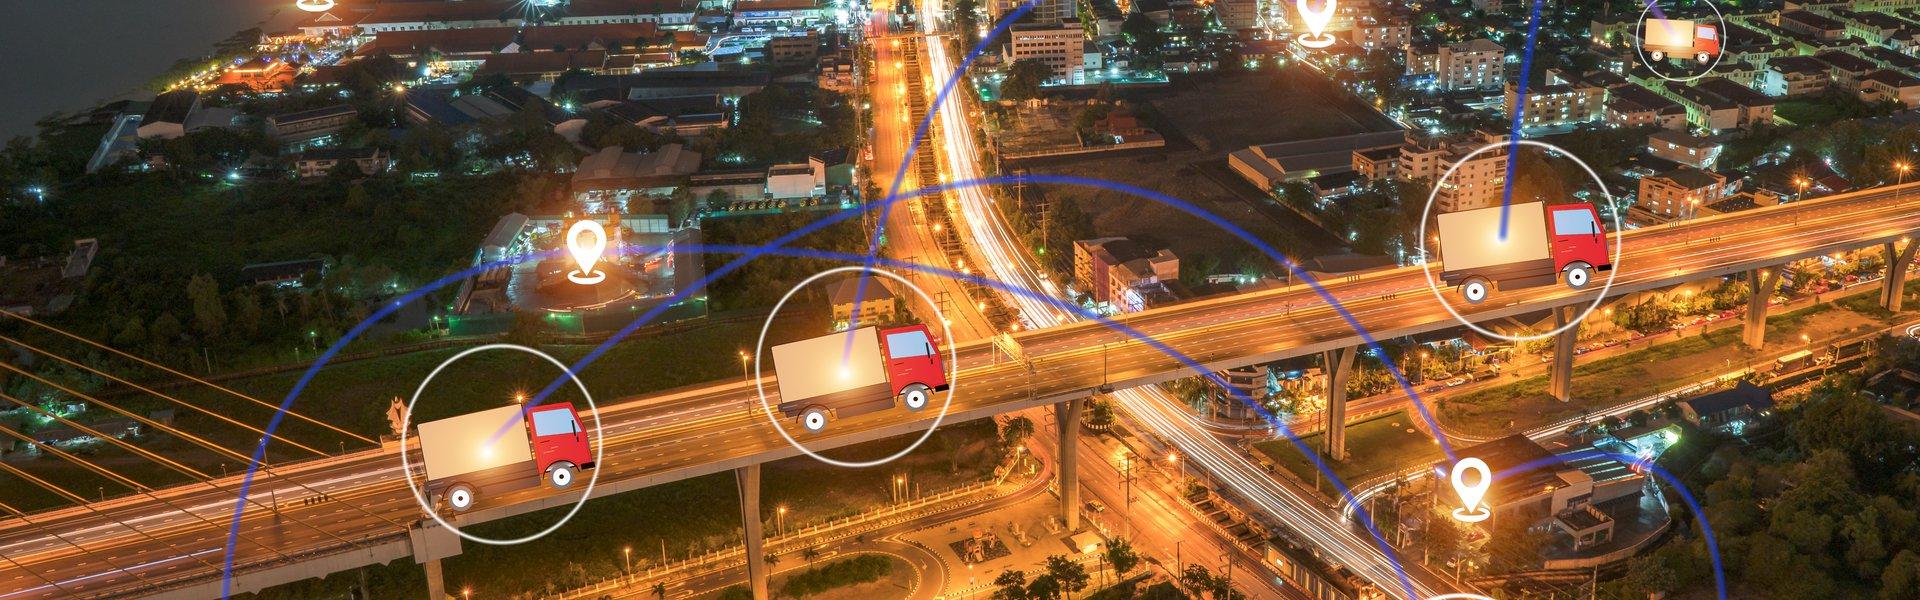 Logistic GPS tracking Followers p540en